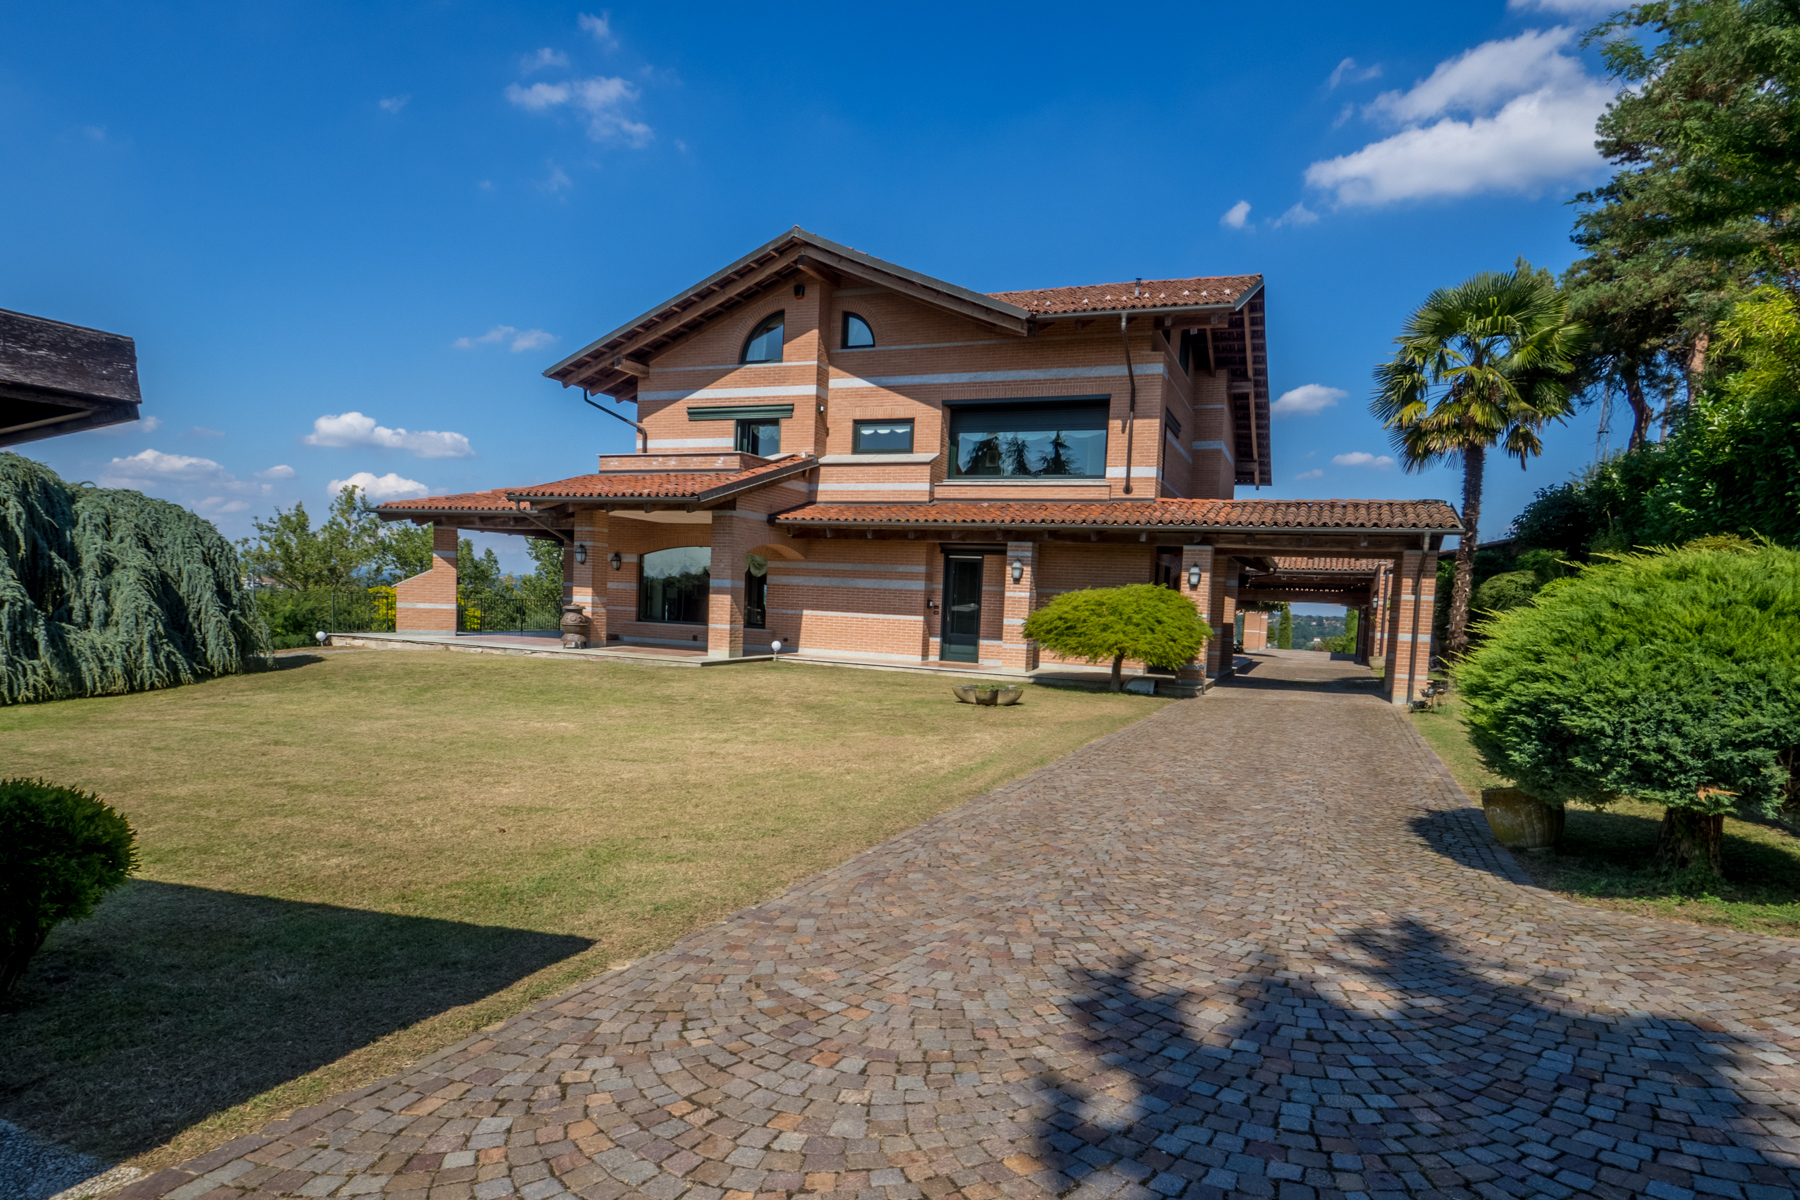 Villa in Vendita a Cantarana: 5 locali, 700 mq